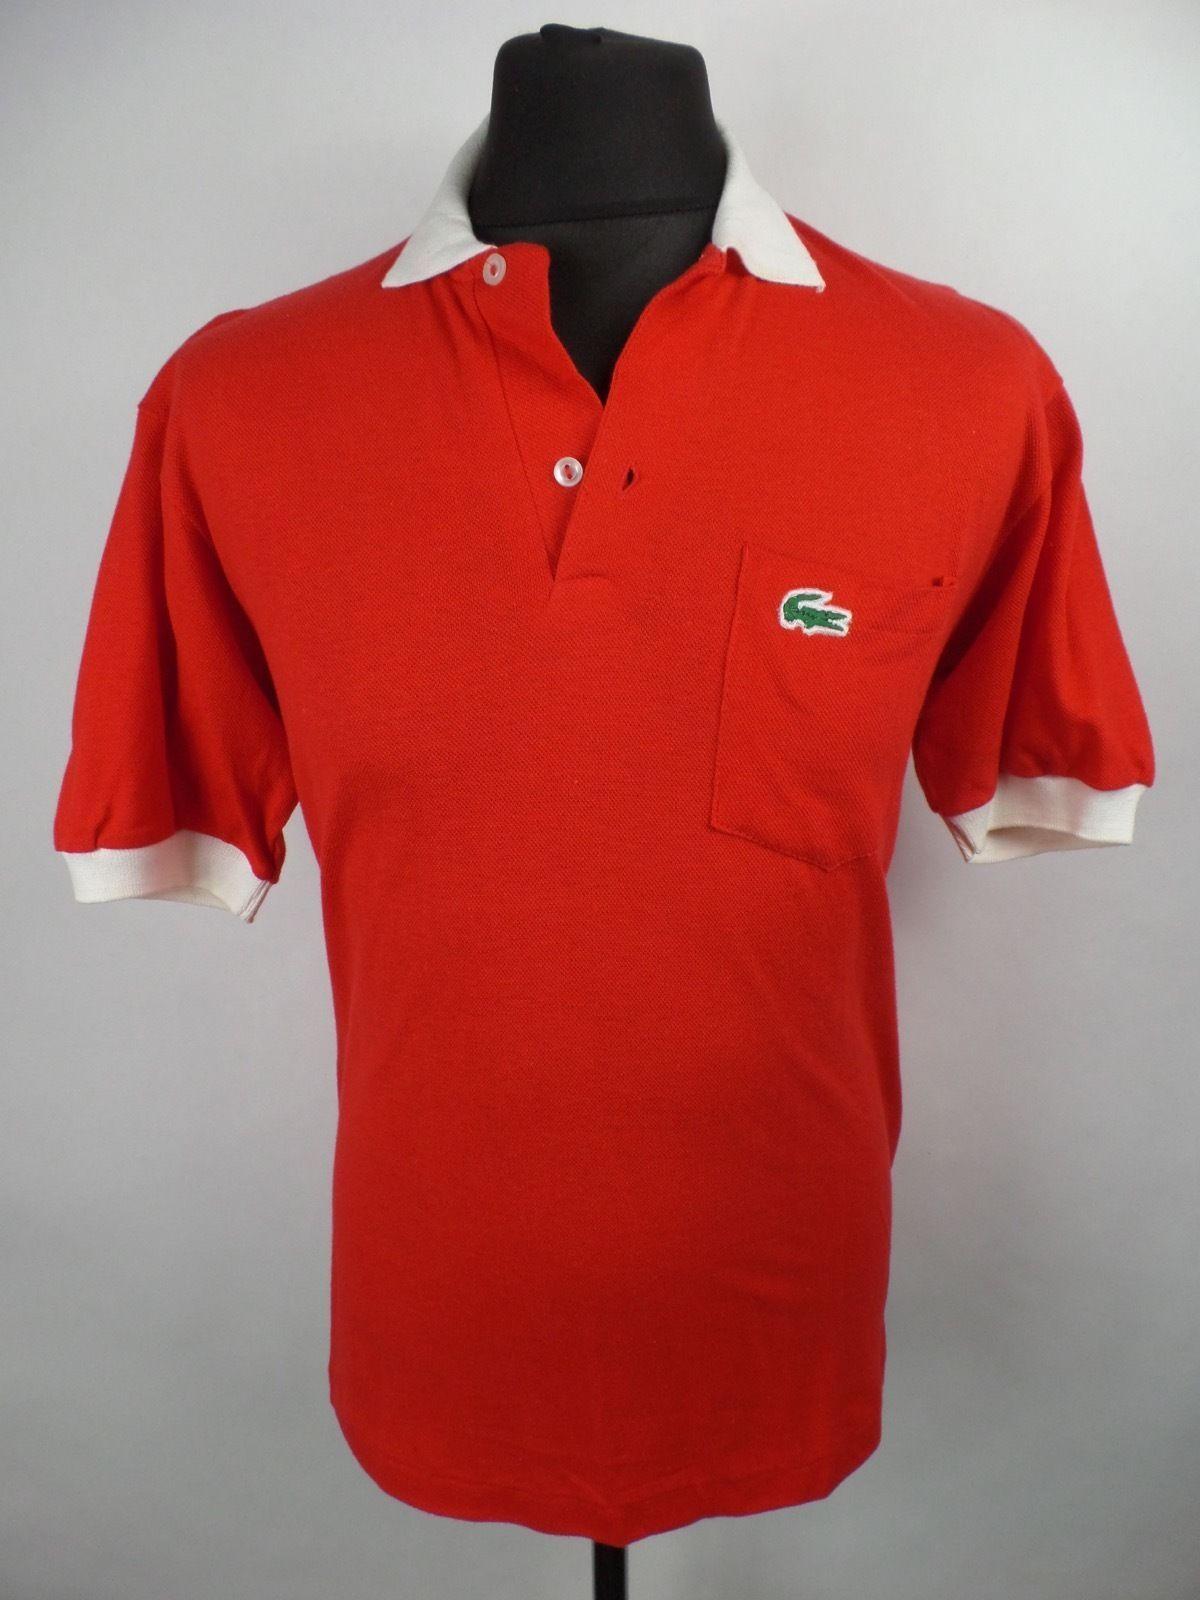 3f5aacfd3905 Vintage LACOSTE Polo Shirt